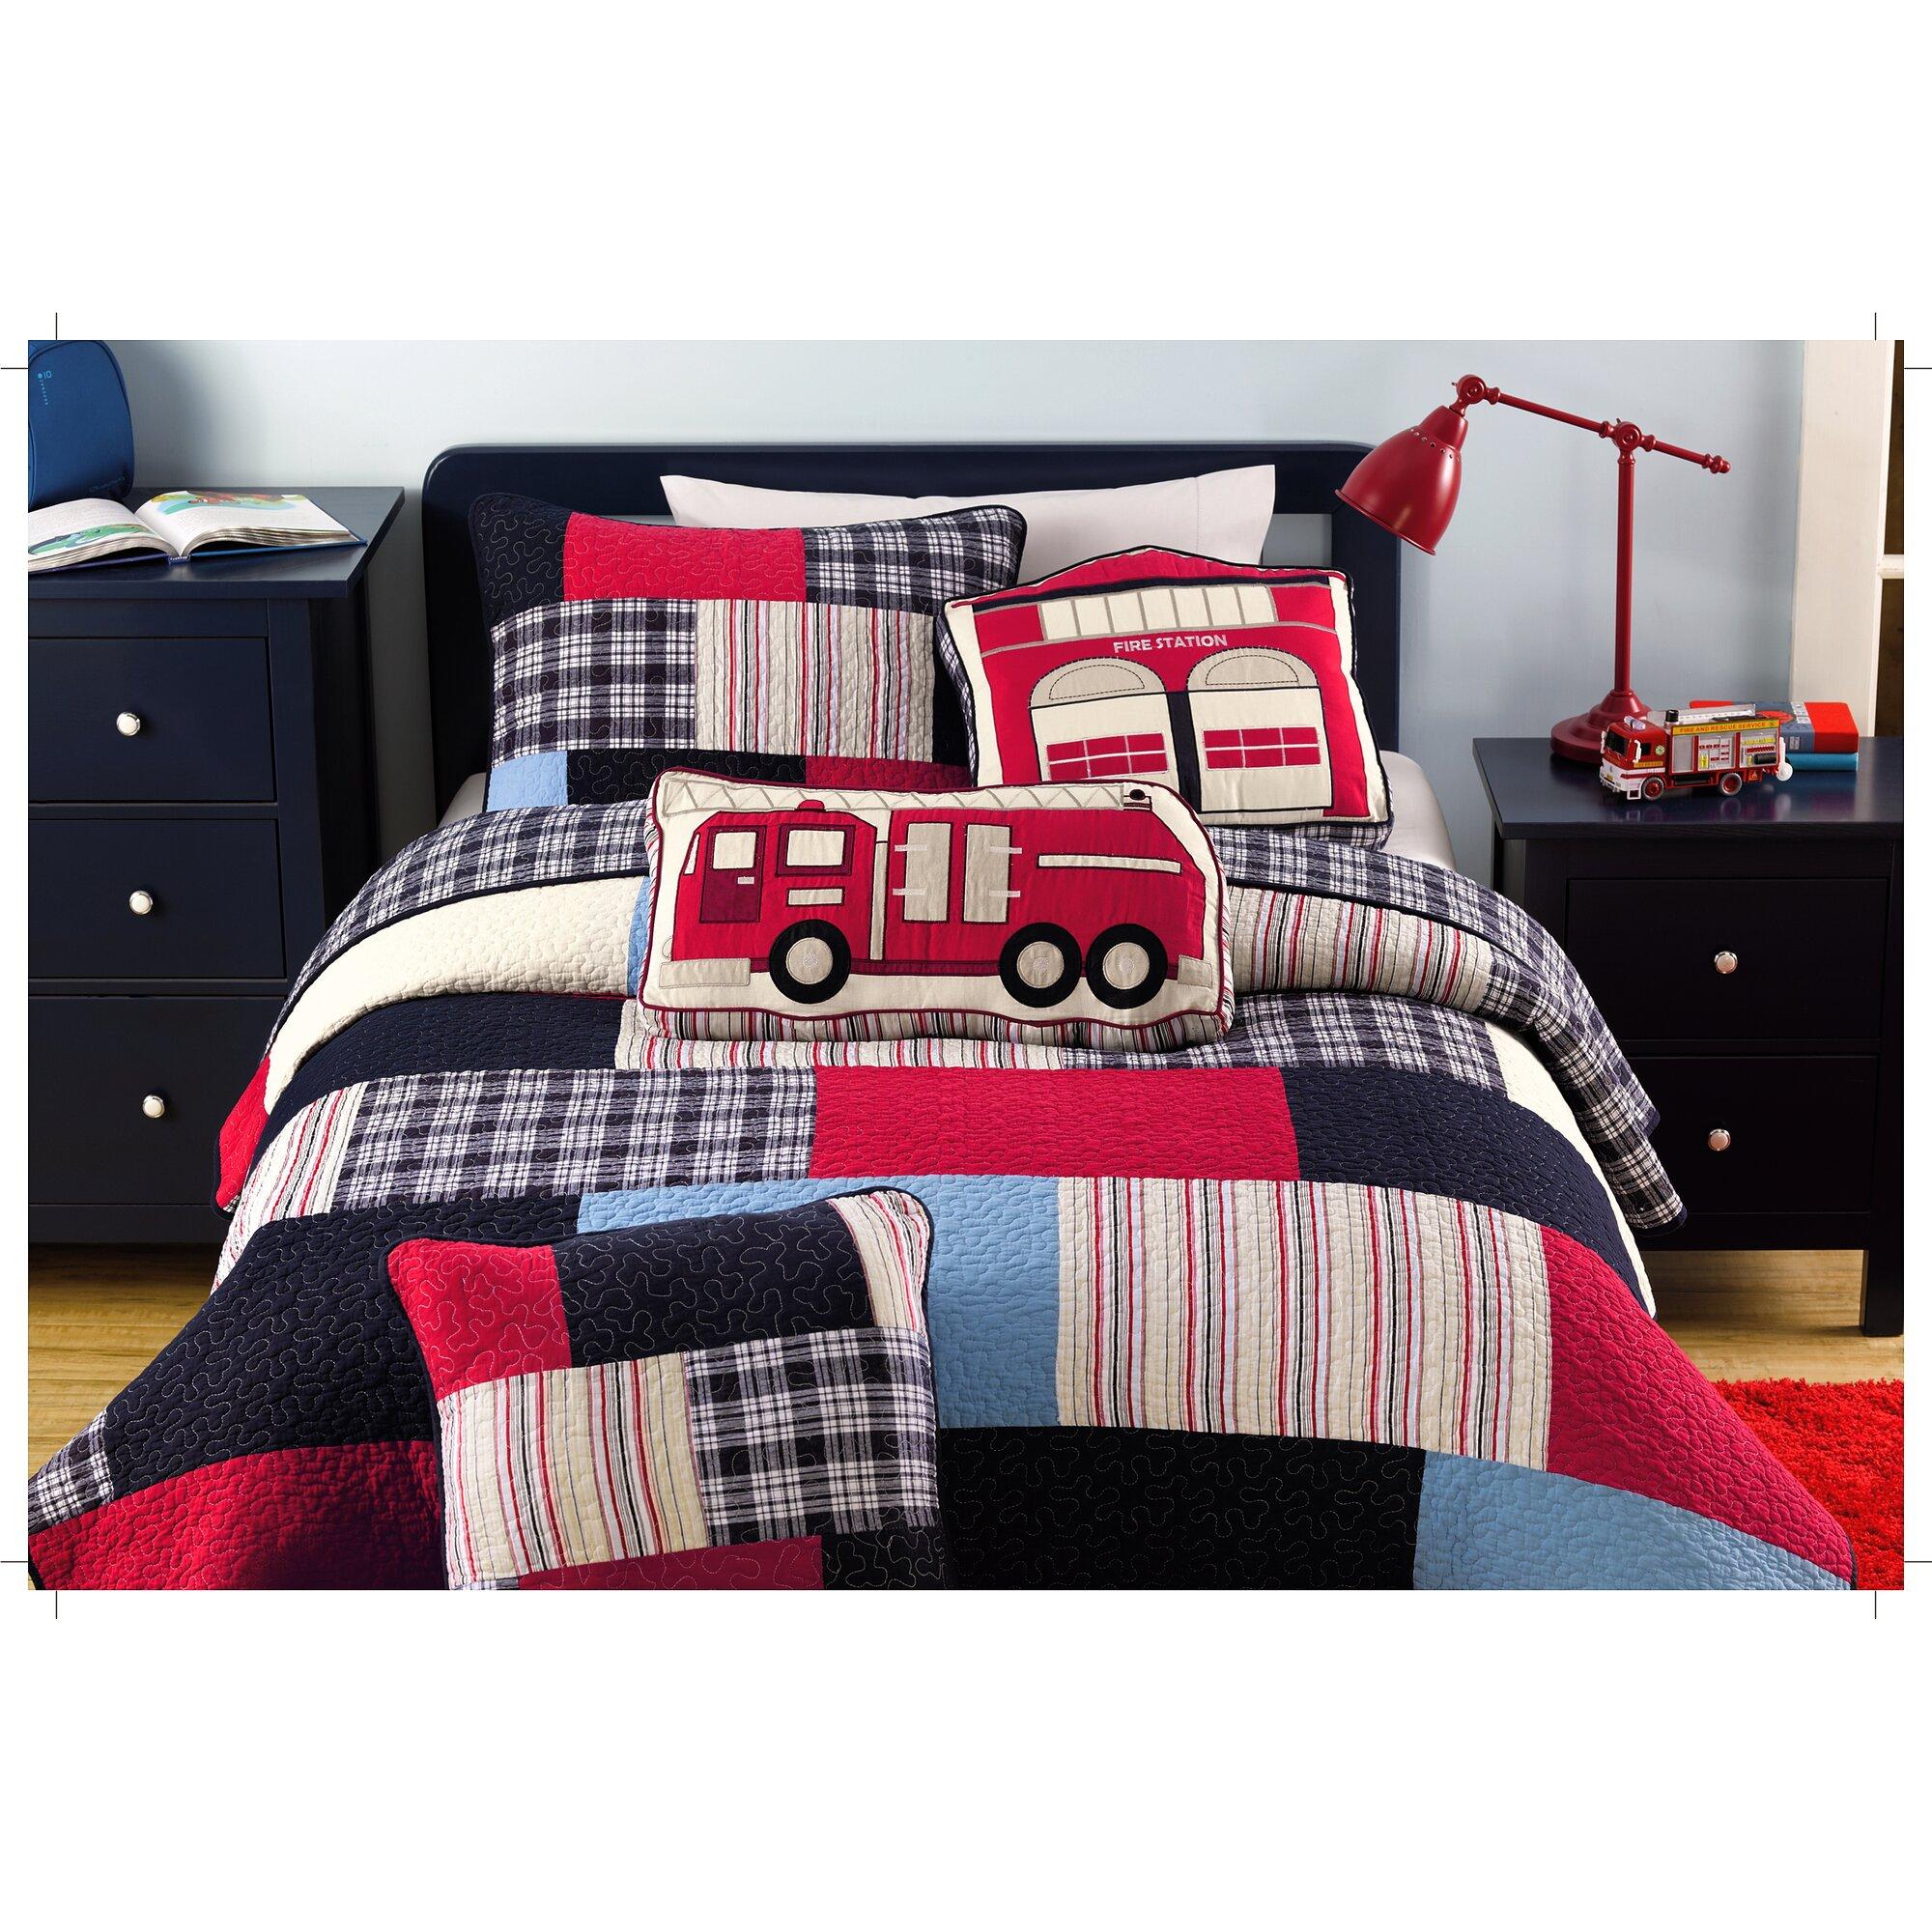 Bed sheet set with quilt - Patchwork Quilt Set